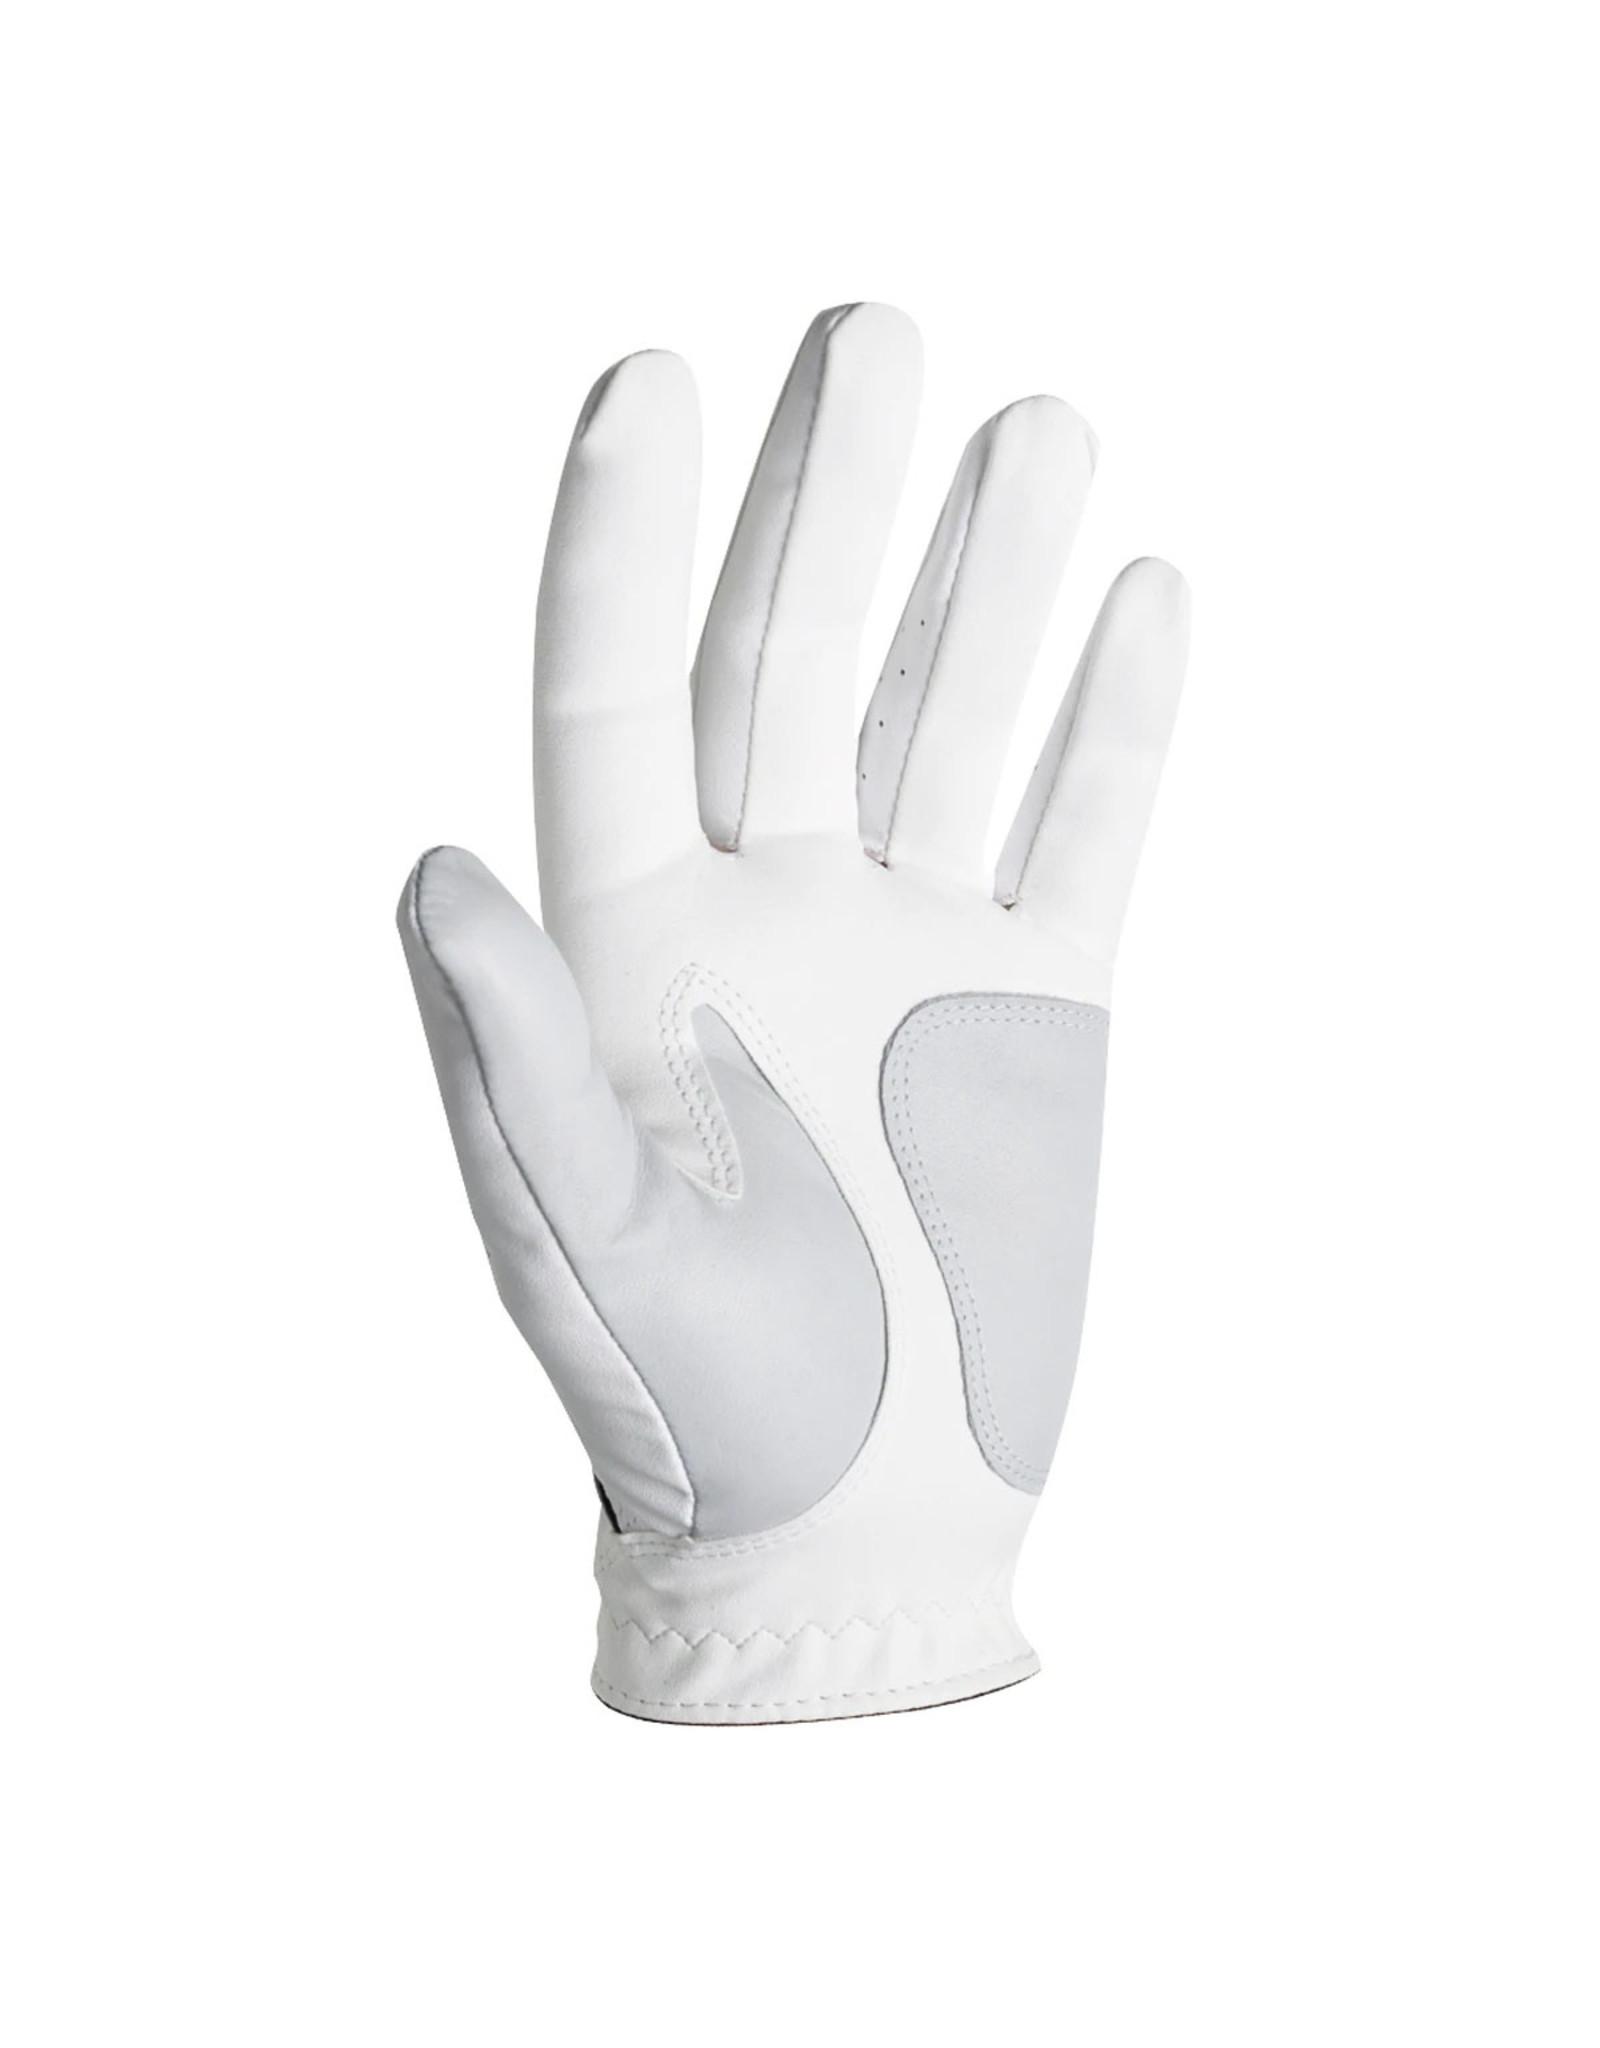 FootJoy FootJoy Men's WeatherSof Glove White